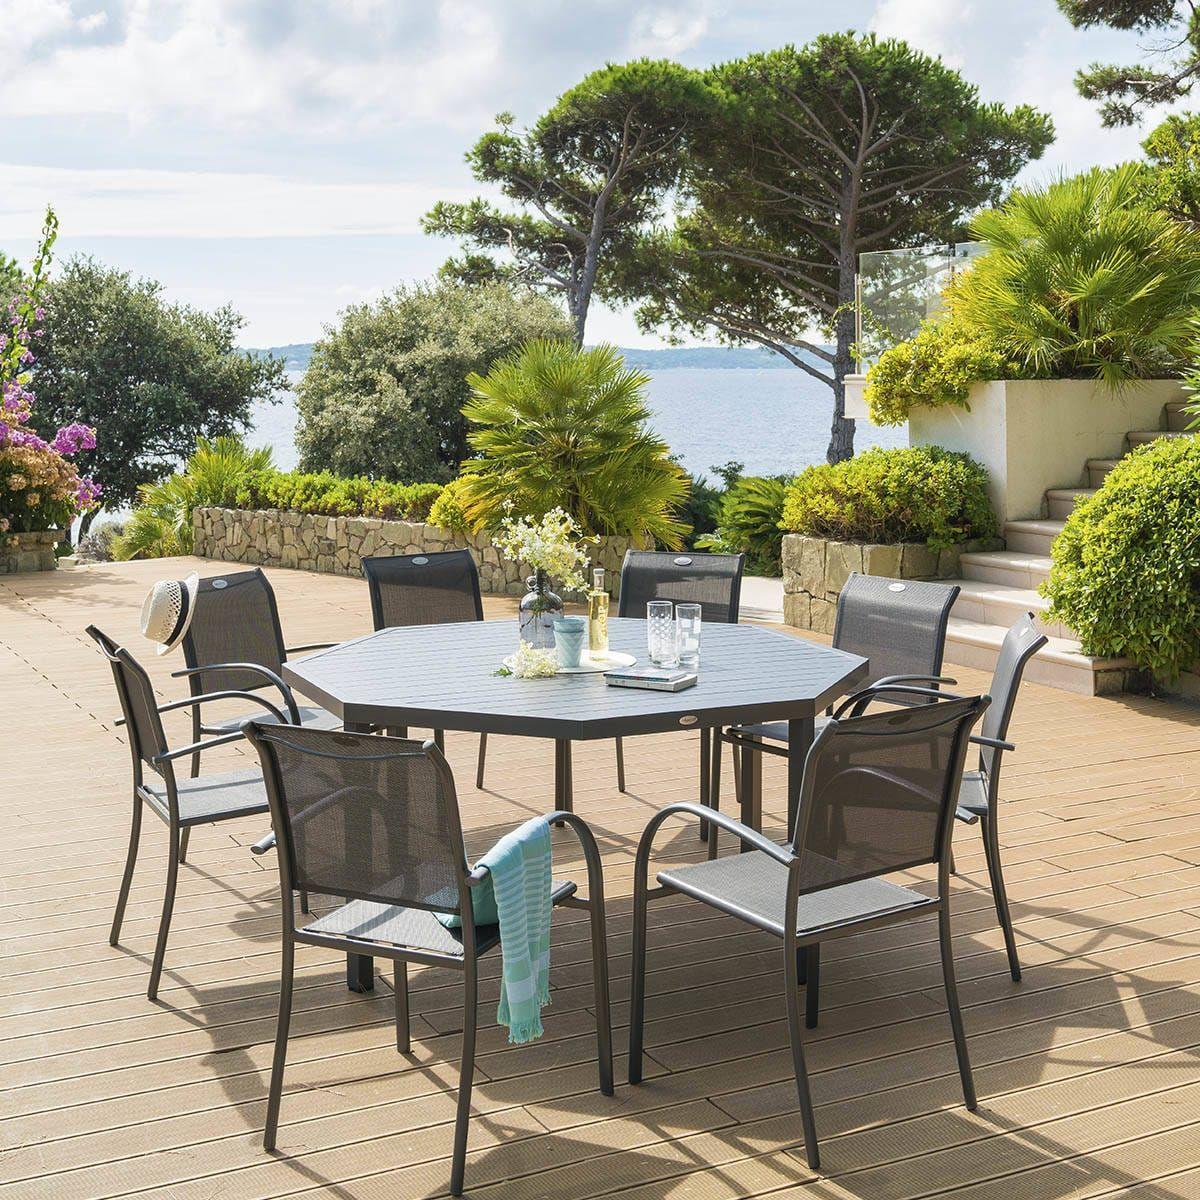 Table de jardin octogonale Piazza Graphite | Table de jardin ...